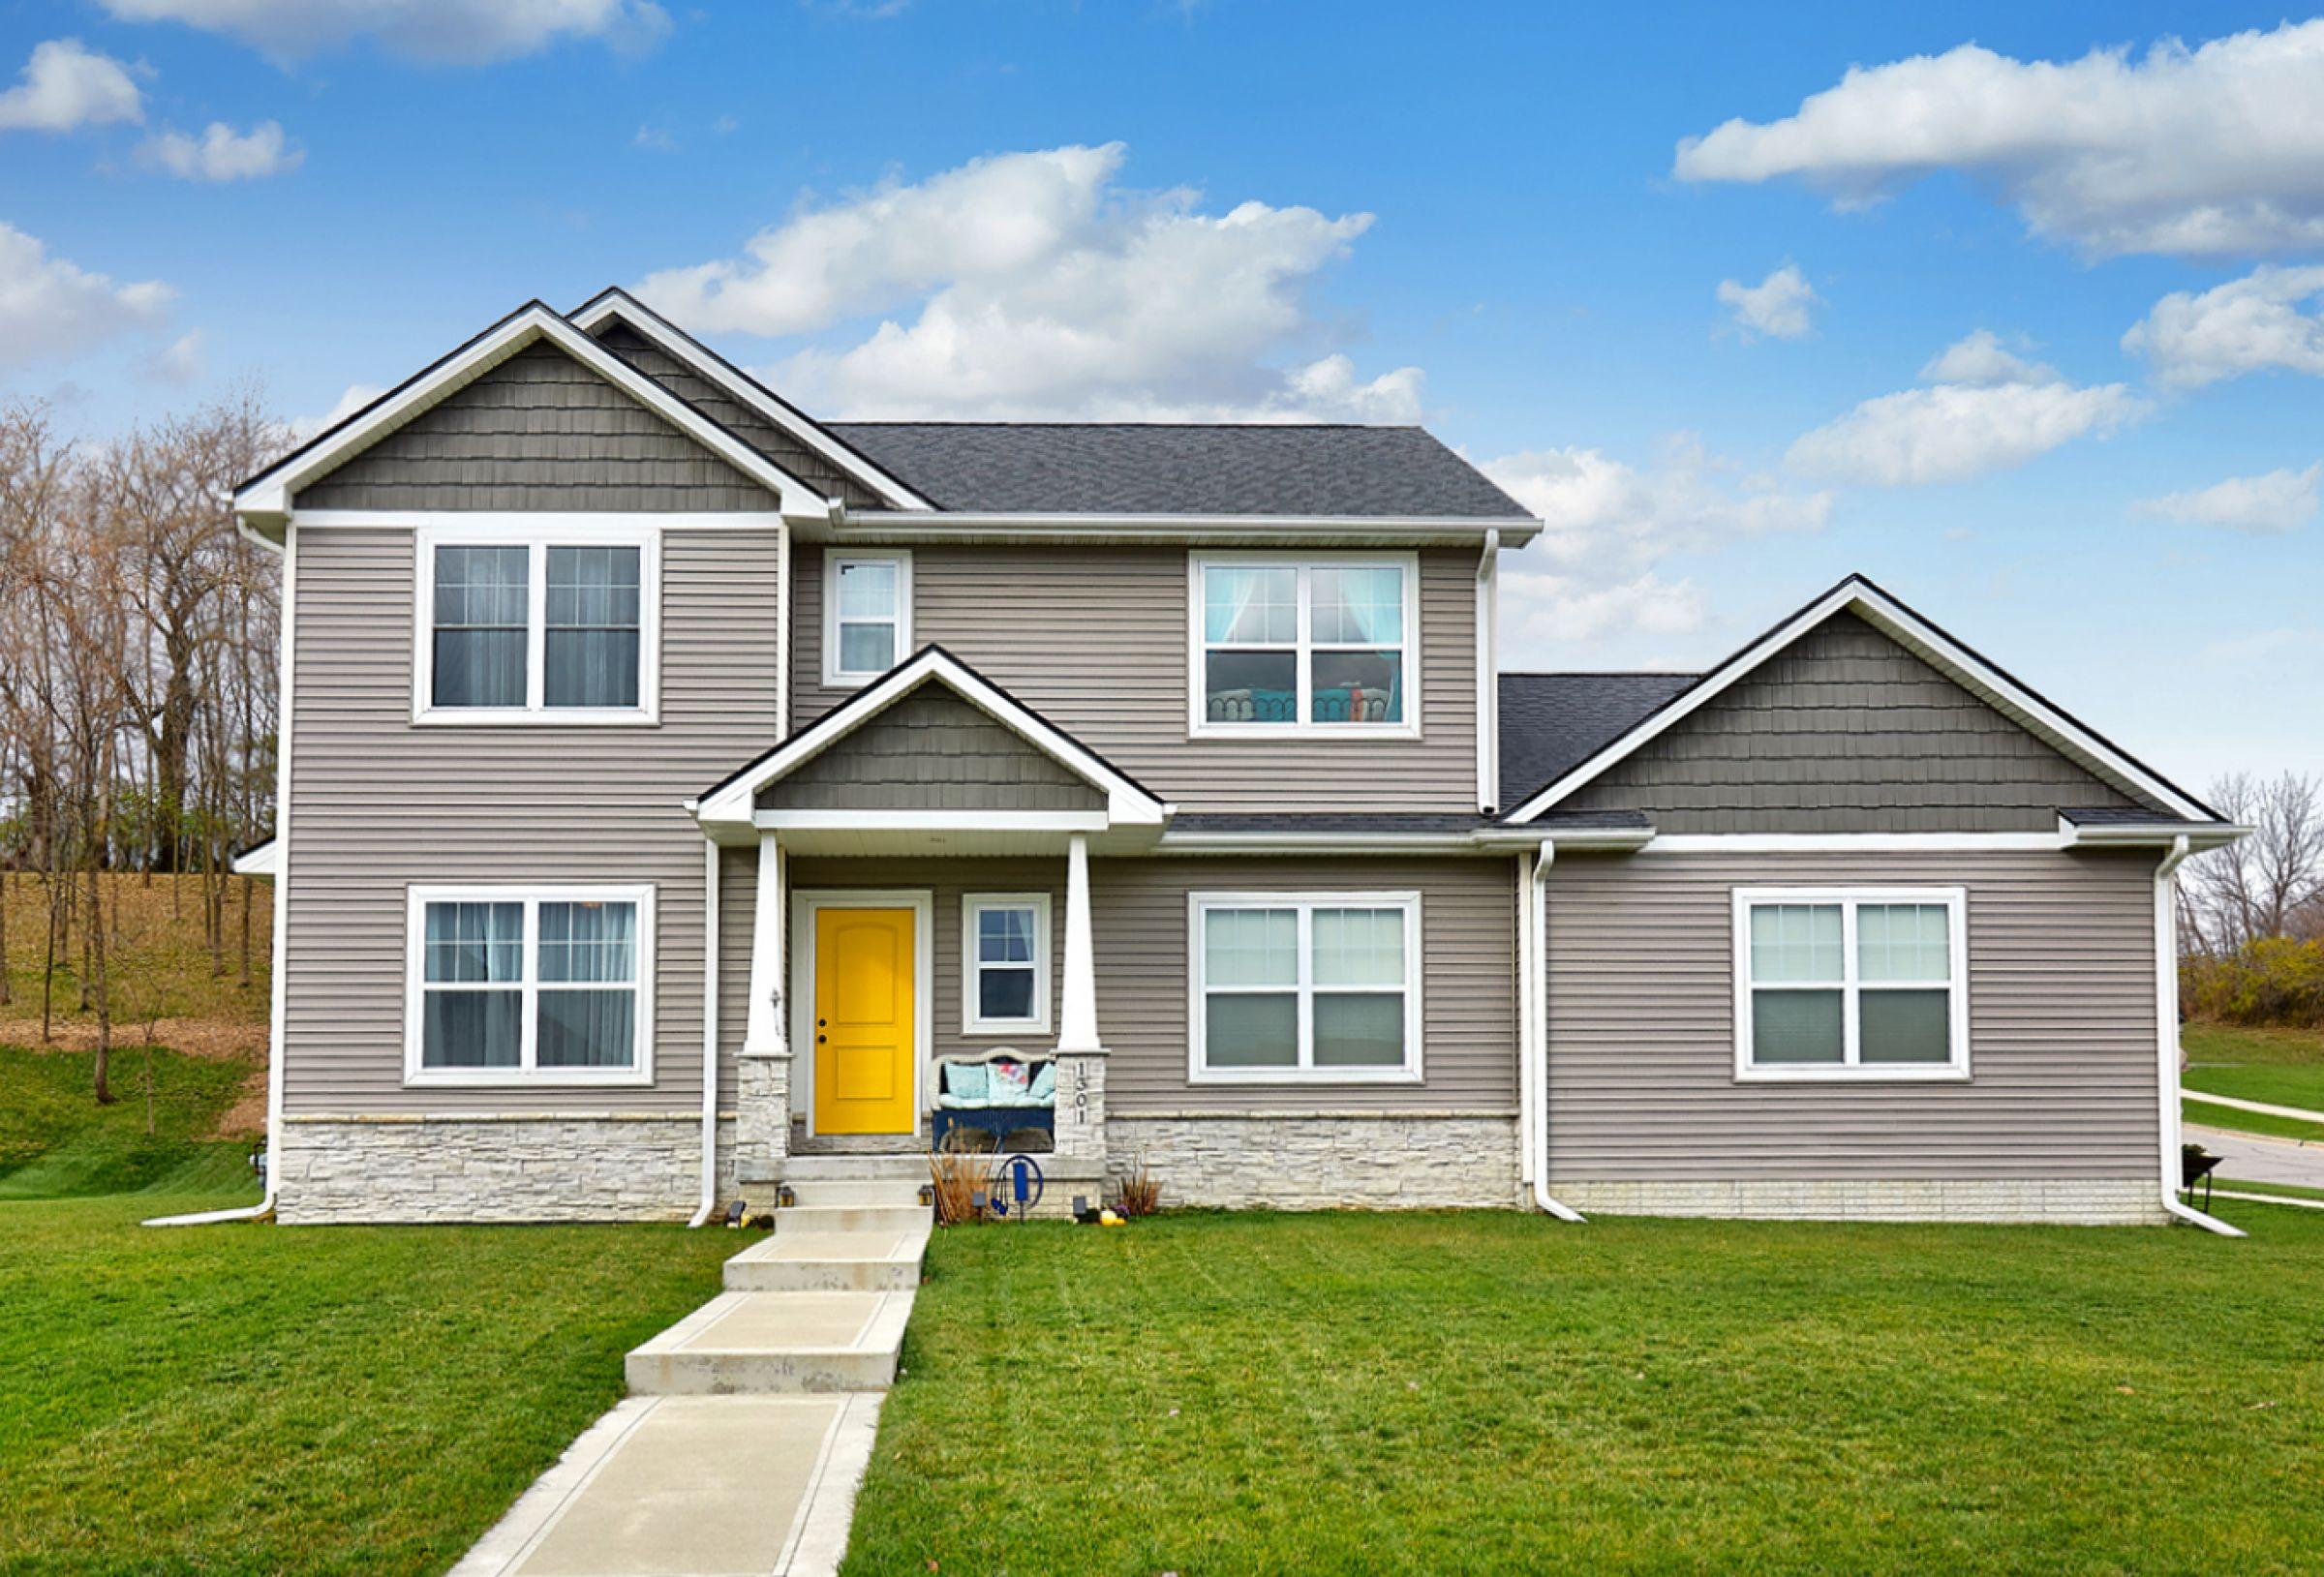 residential-warren-county-iowa-1-acres-listing-number-15254-0-2020-11-11-165757.jpg